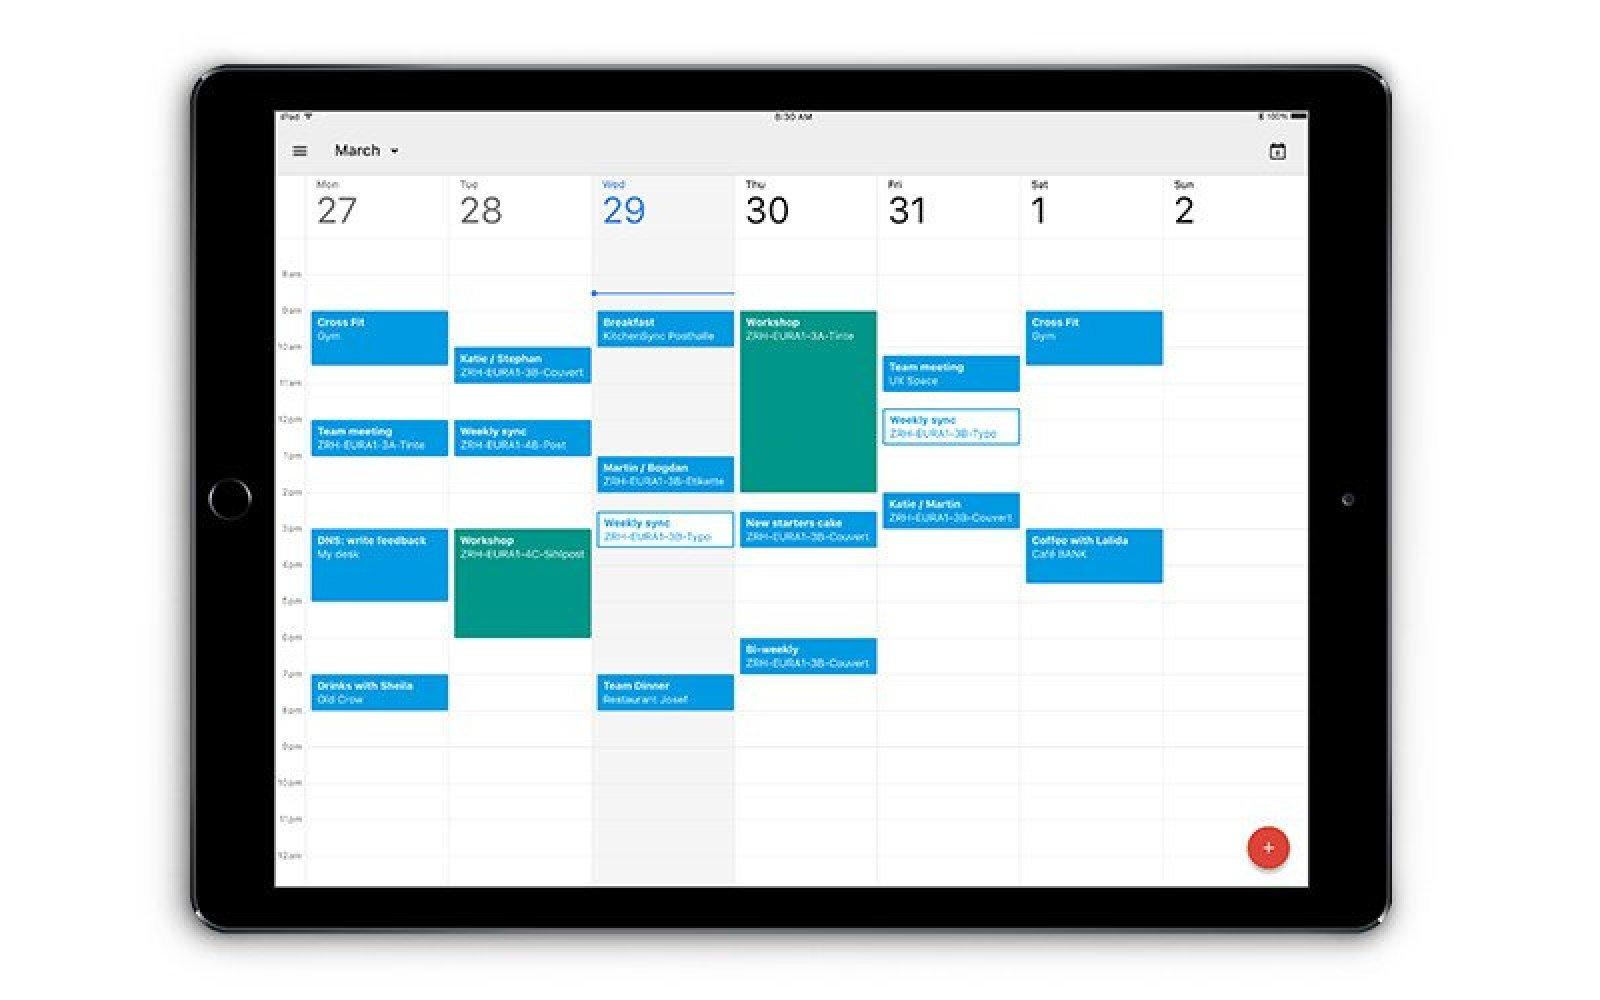 Google finally releases Calendar app for iPad